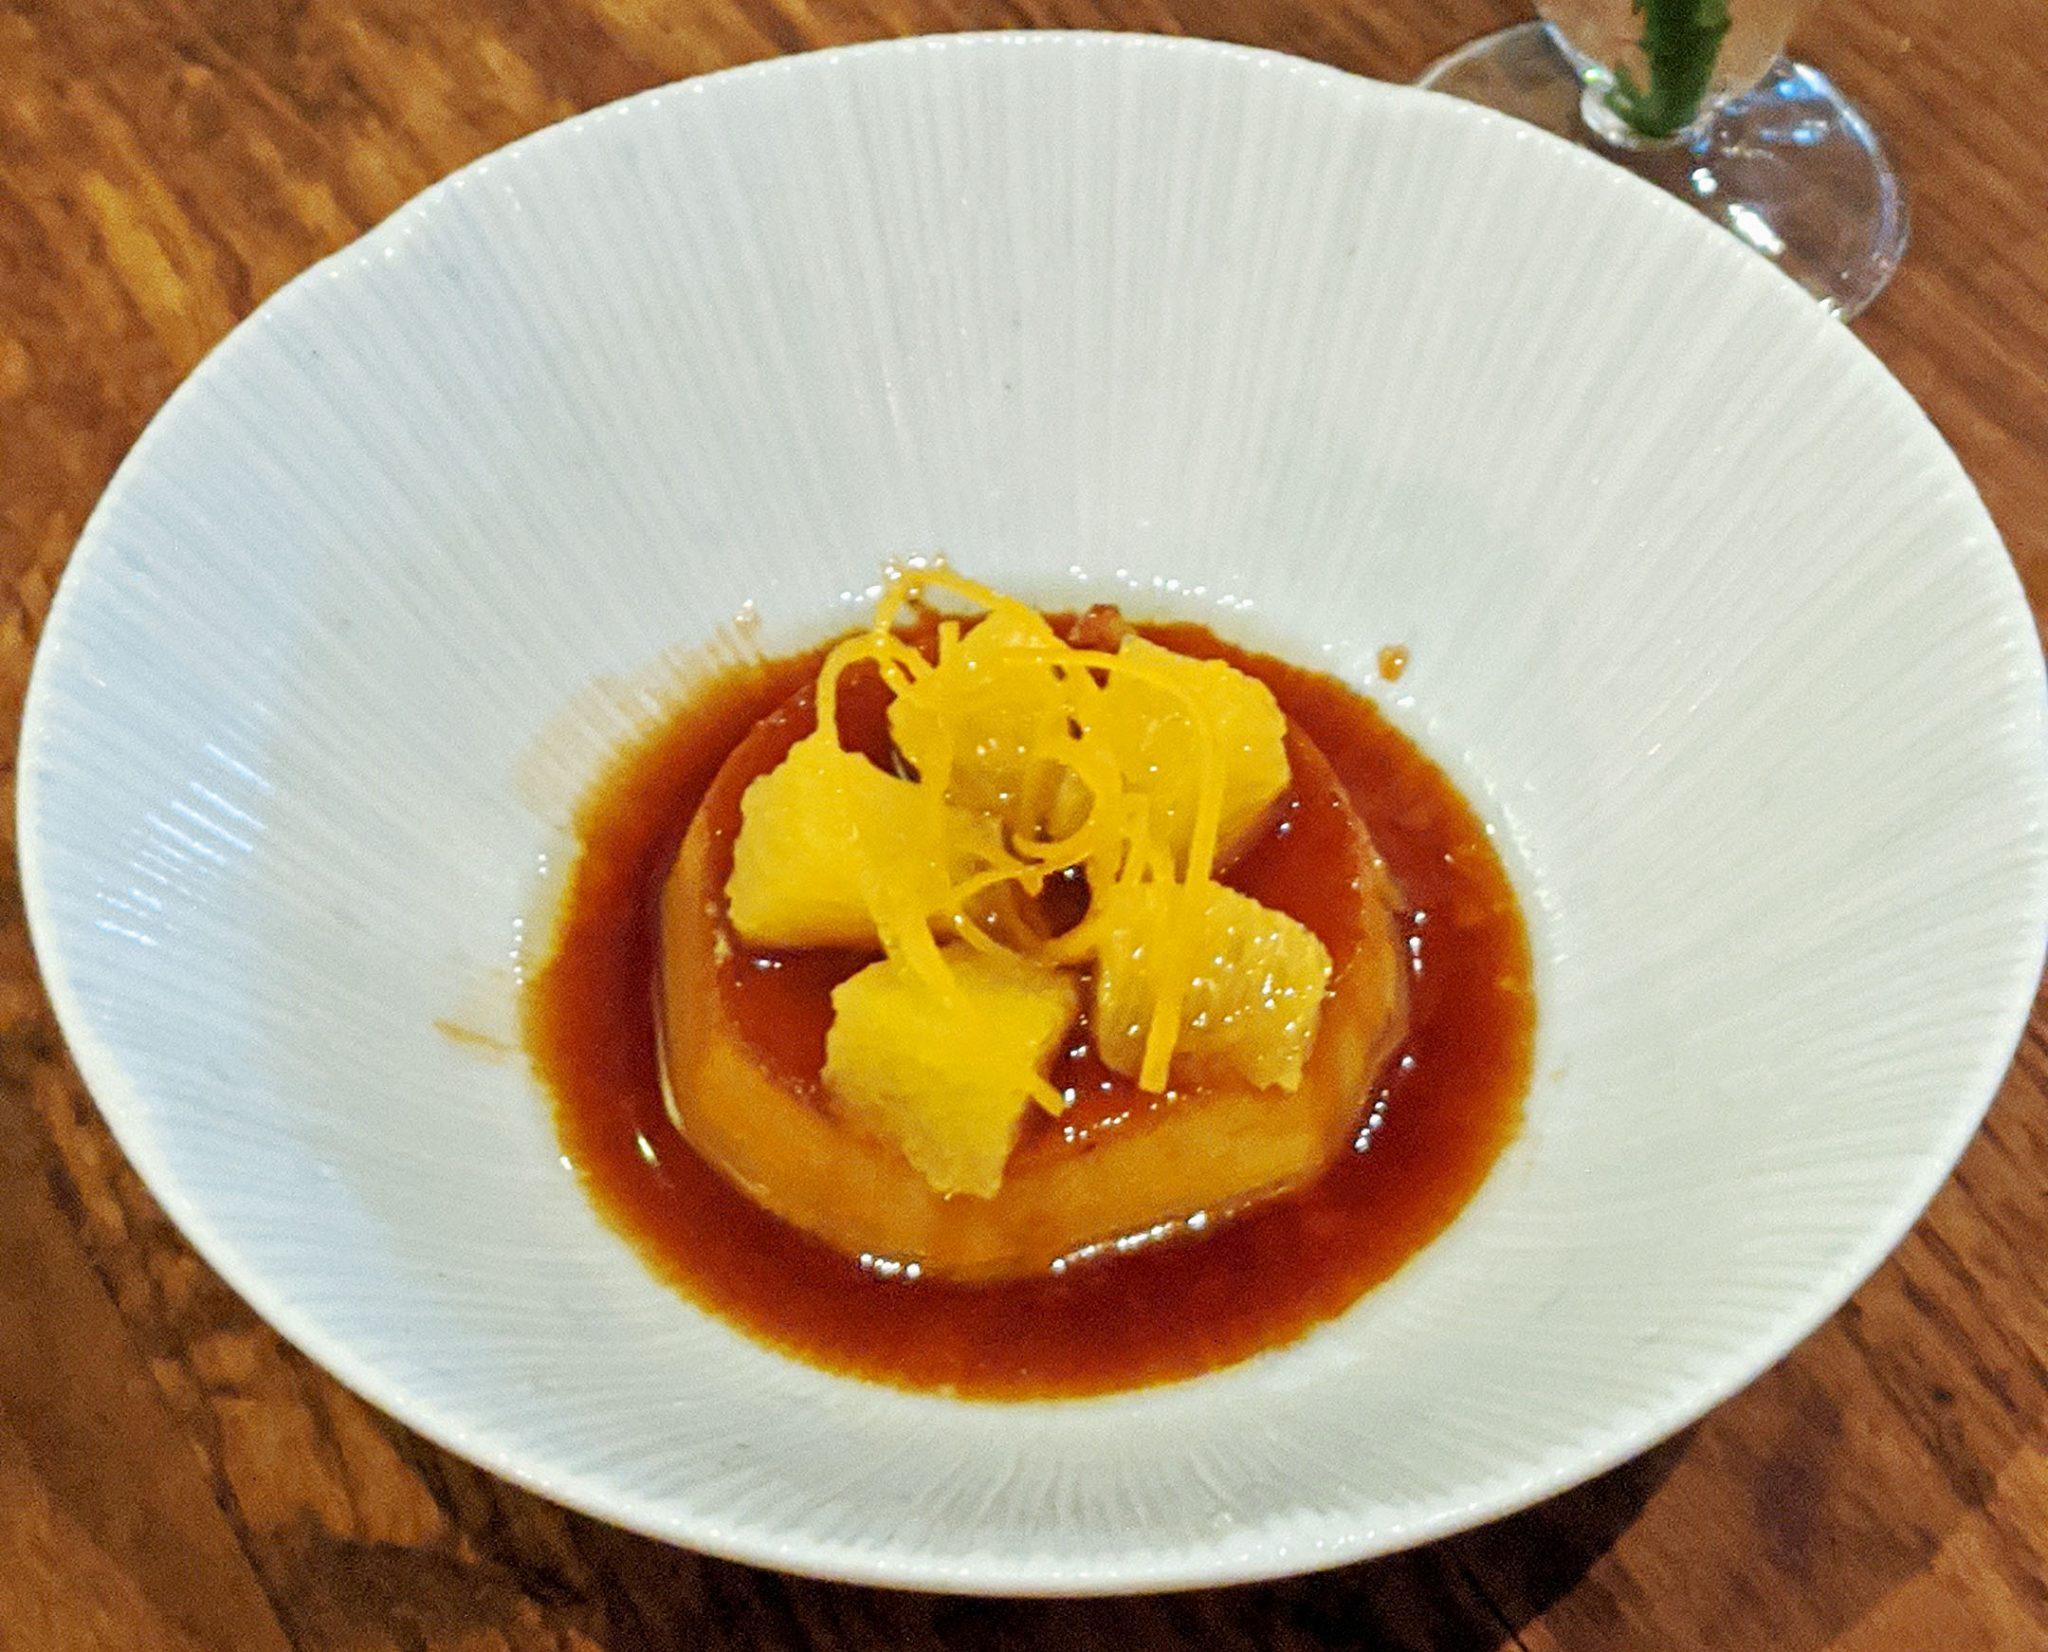 Pudim with Caramelised Orange